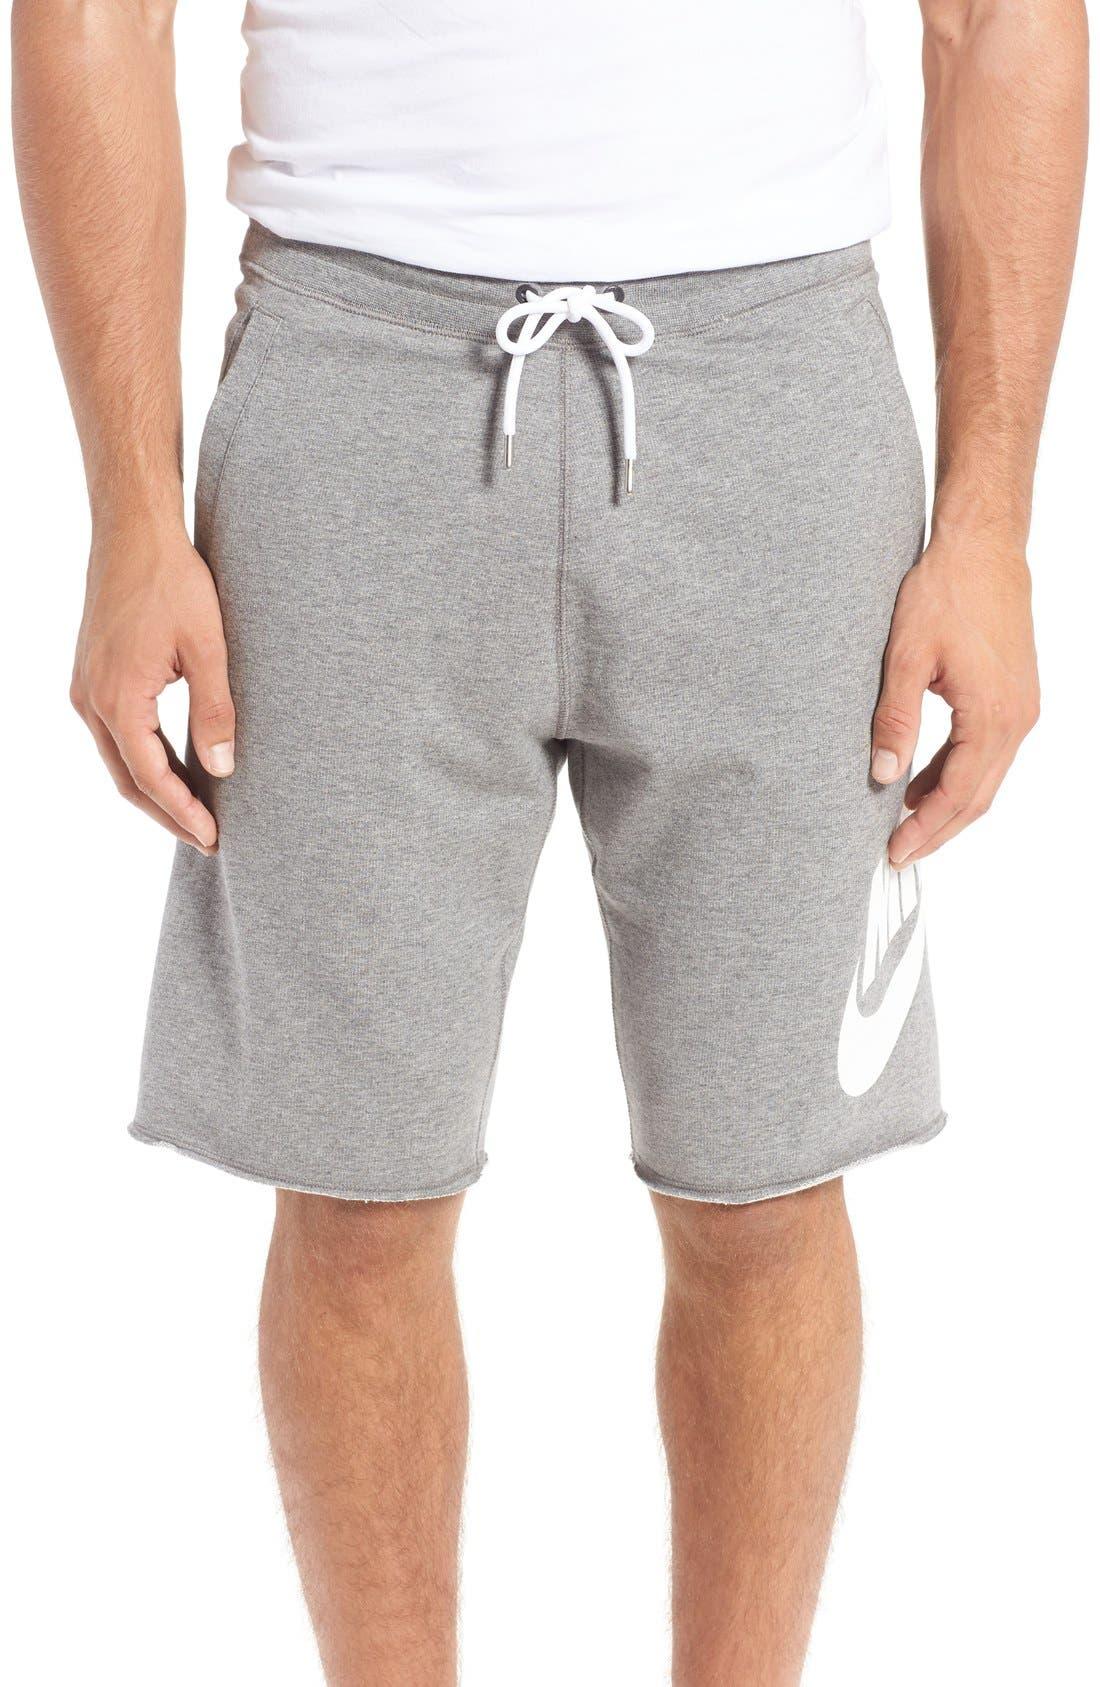 Nike 'NSW' Logo French Terry Shorts